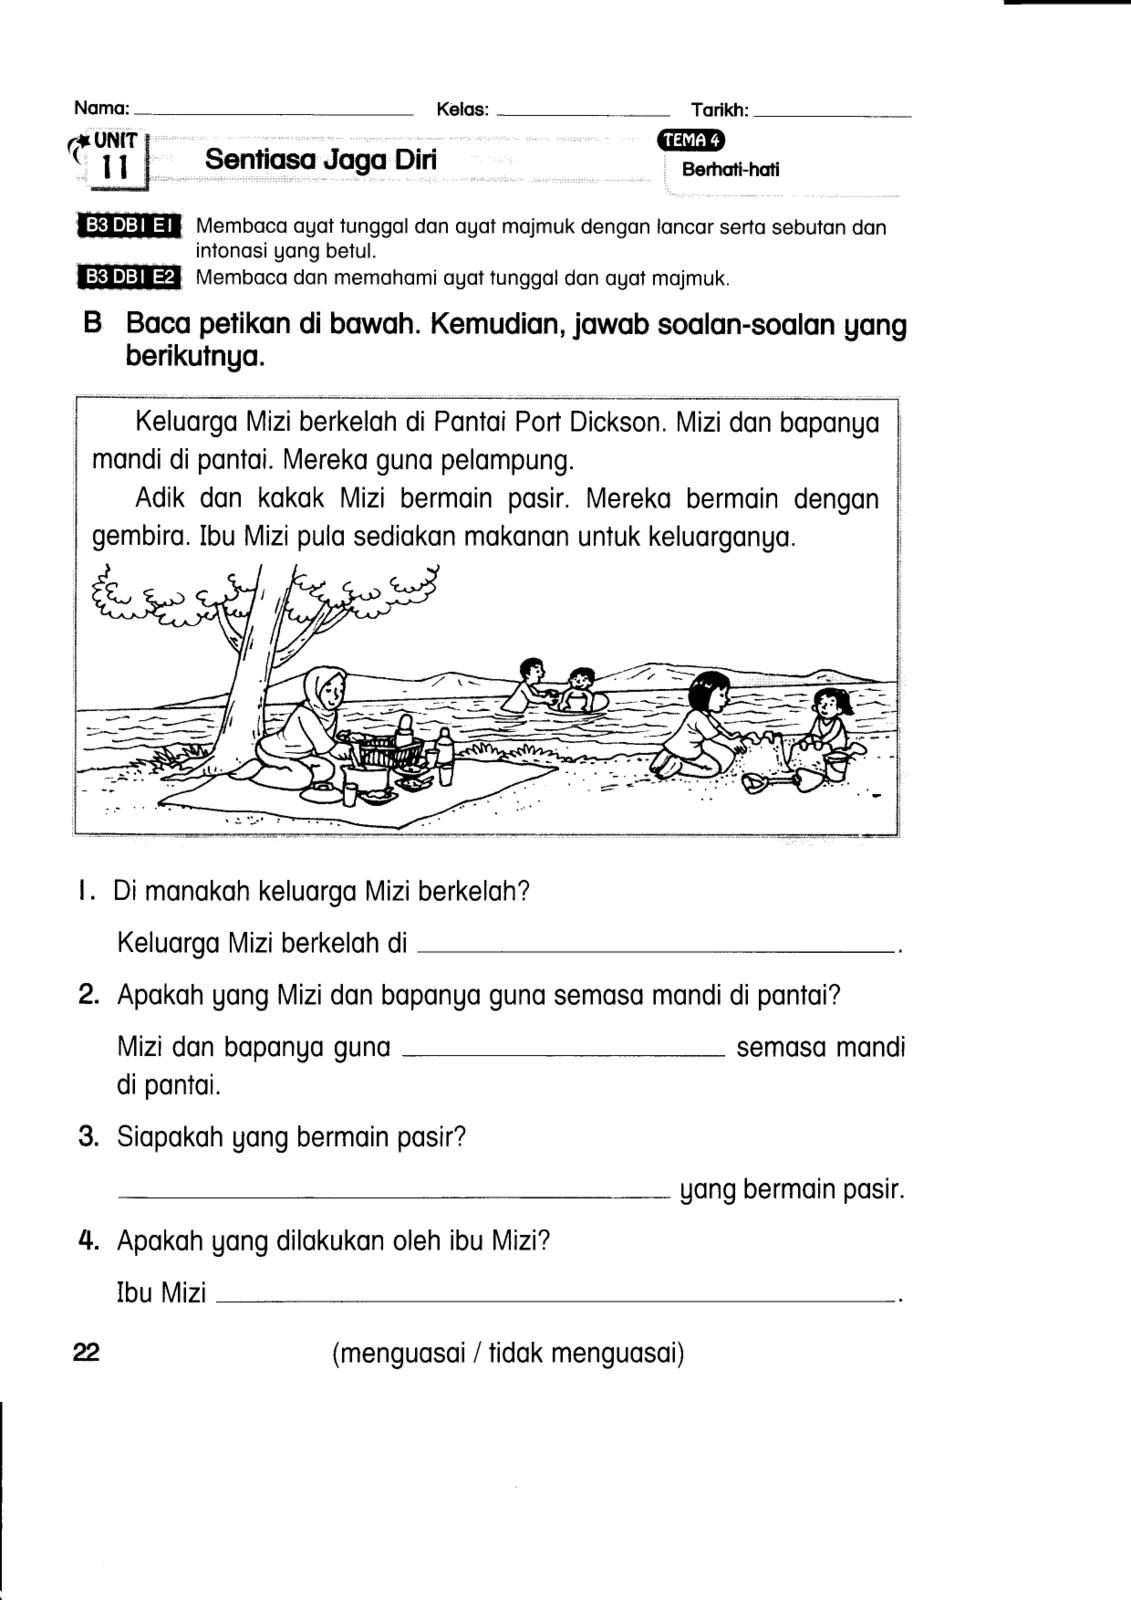 Contoh Soalan Latihan Bahasa Melayu Tahun 5 Soalan Bi